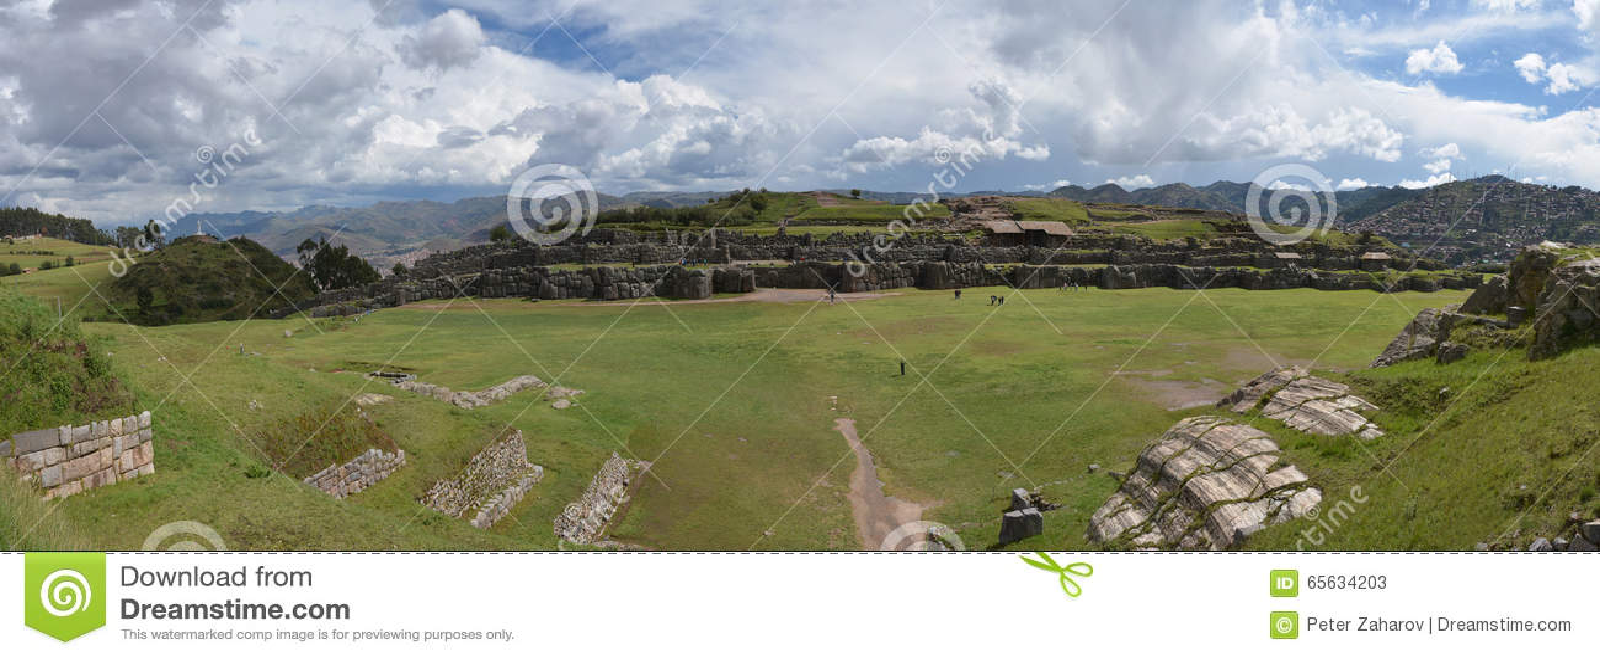 Ruines de Sacsayhuaman, Cuzco, Pérou